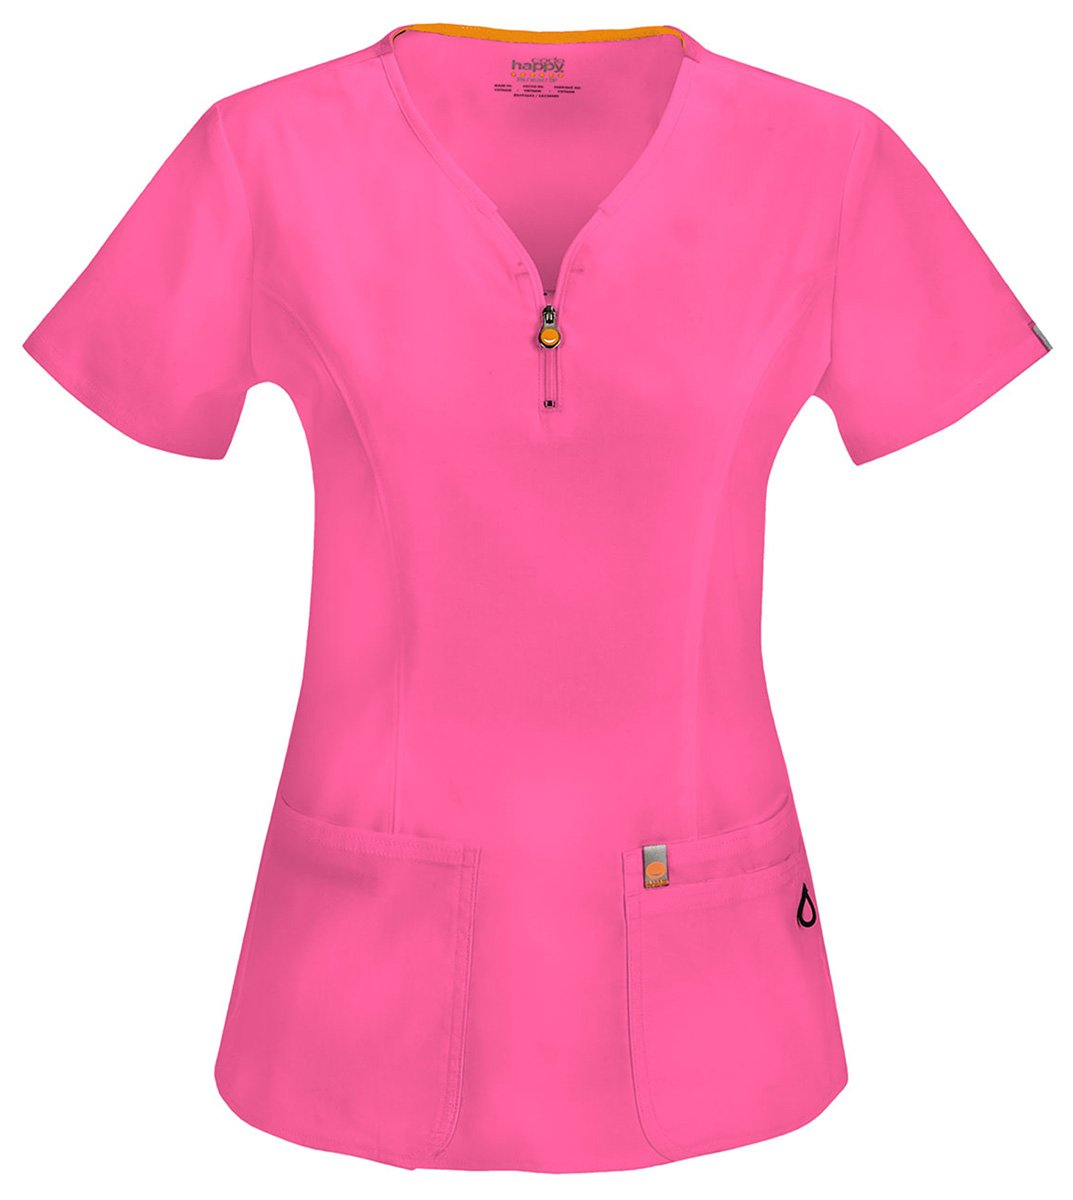 Code Happy Women's Medical Zipper V-Neck T-shirt_Shocking Pink_Small